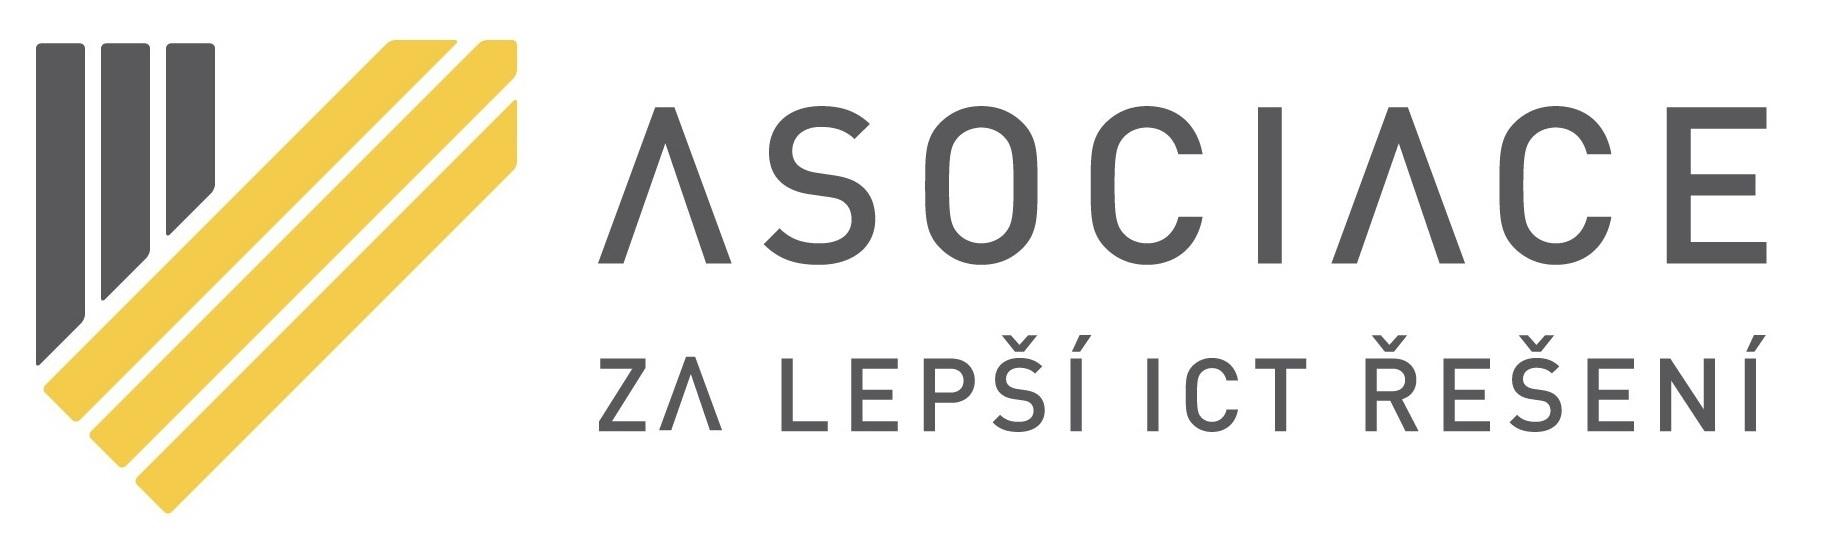 asociace-za-lepsi-ict-reseni-logo